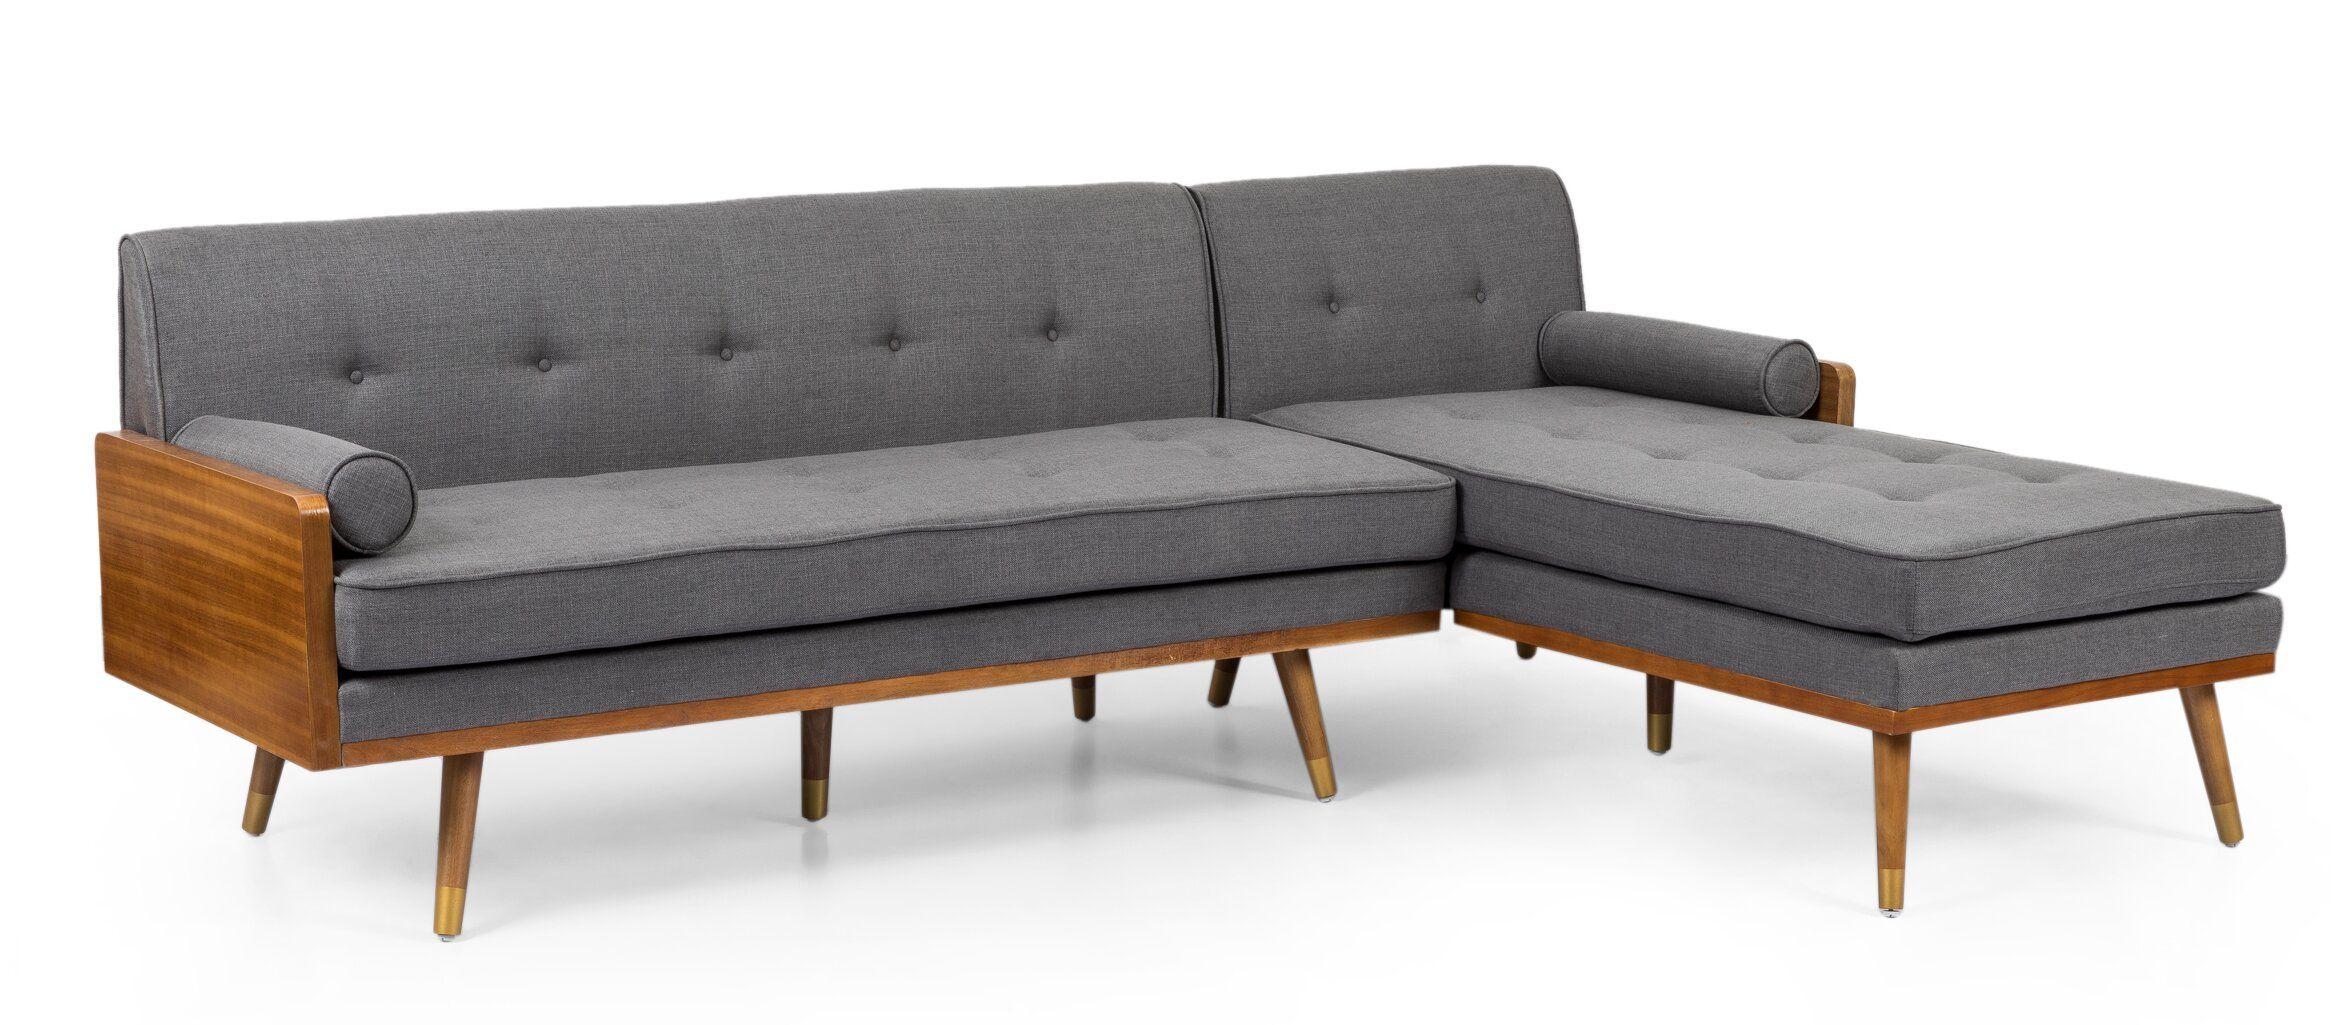 Bridgeport 100 Wide Right Hand Facing Modular Sofa Chaise Mid Century Modern Sectional Sofa Modern Couch Sectional Modular Sofa